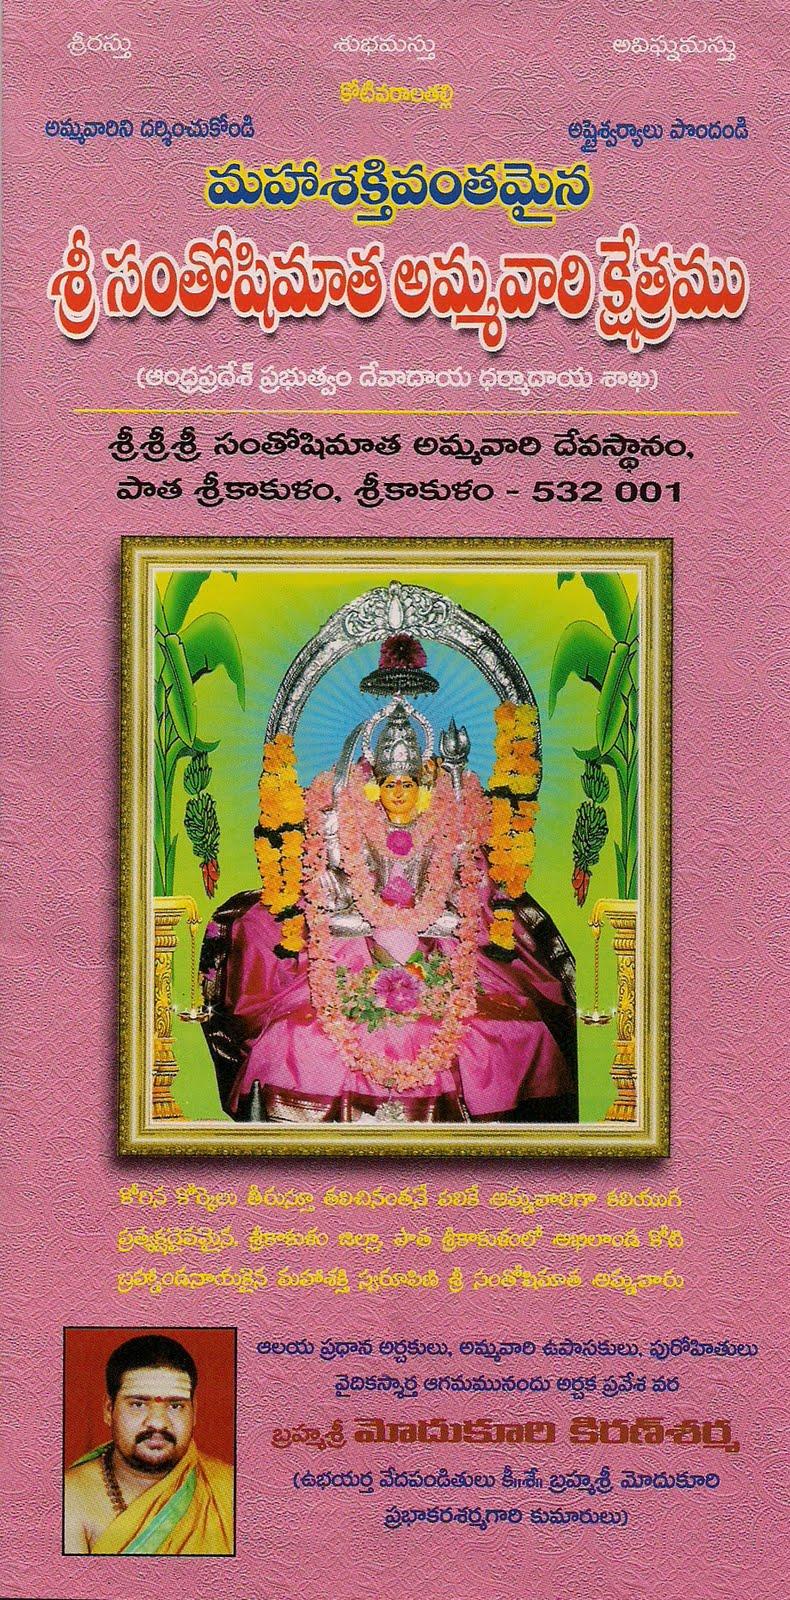 [Santhoshi+mata+Ammavaru+-+Old+Srikakulam.jpg]